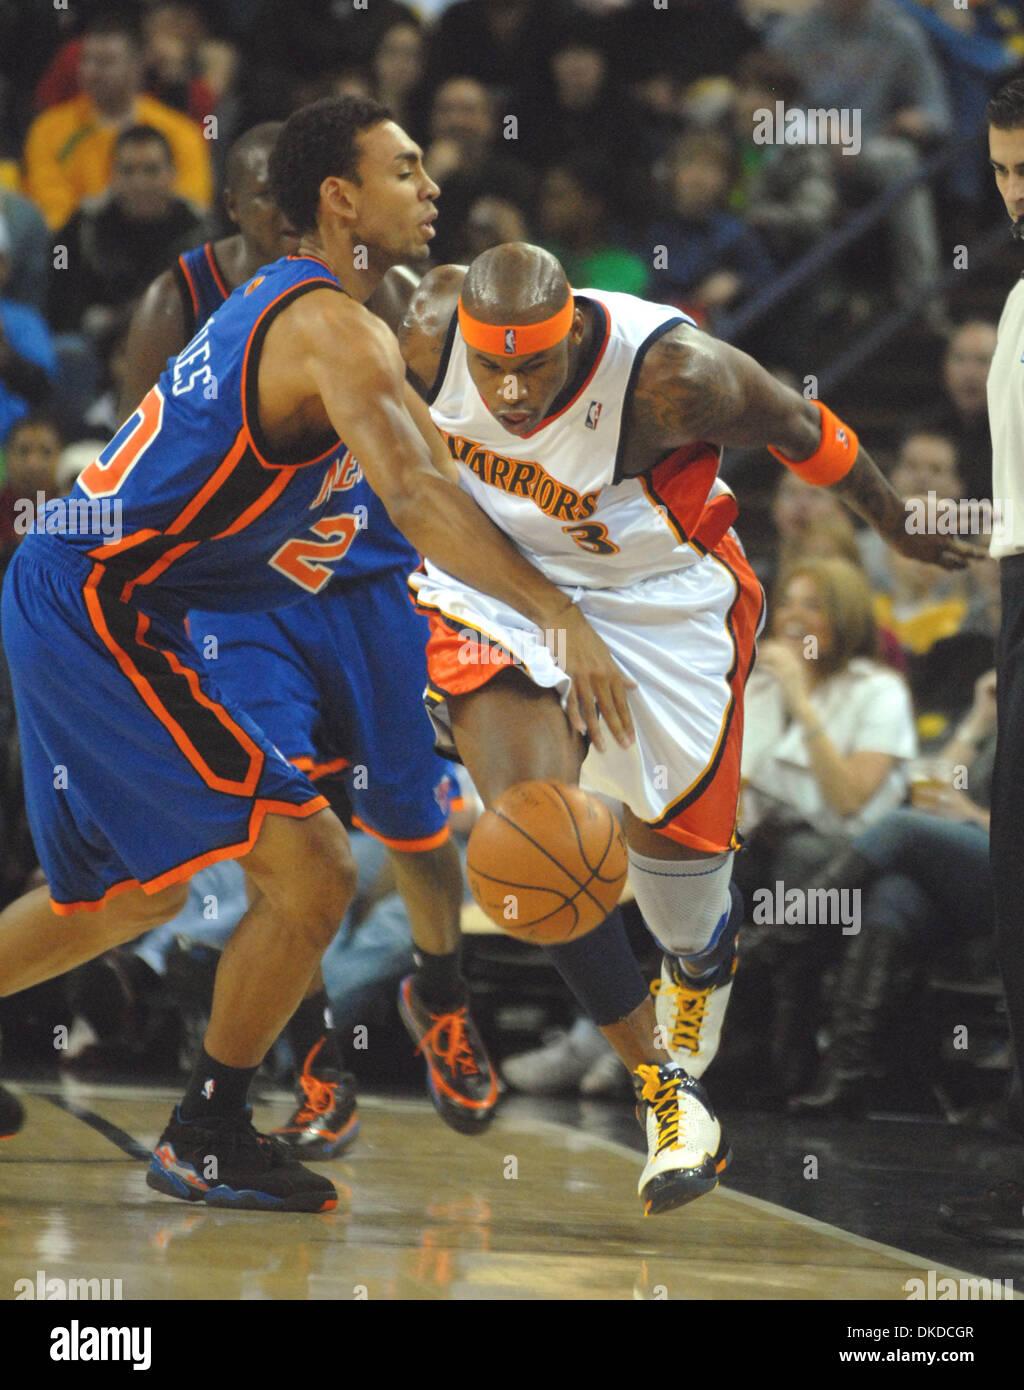 Golden State Warriors Al Harrington and New York Knicks Jared